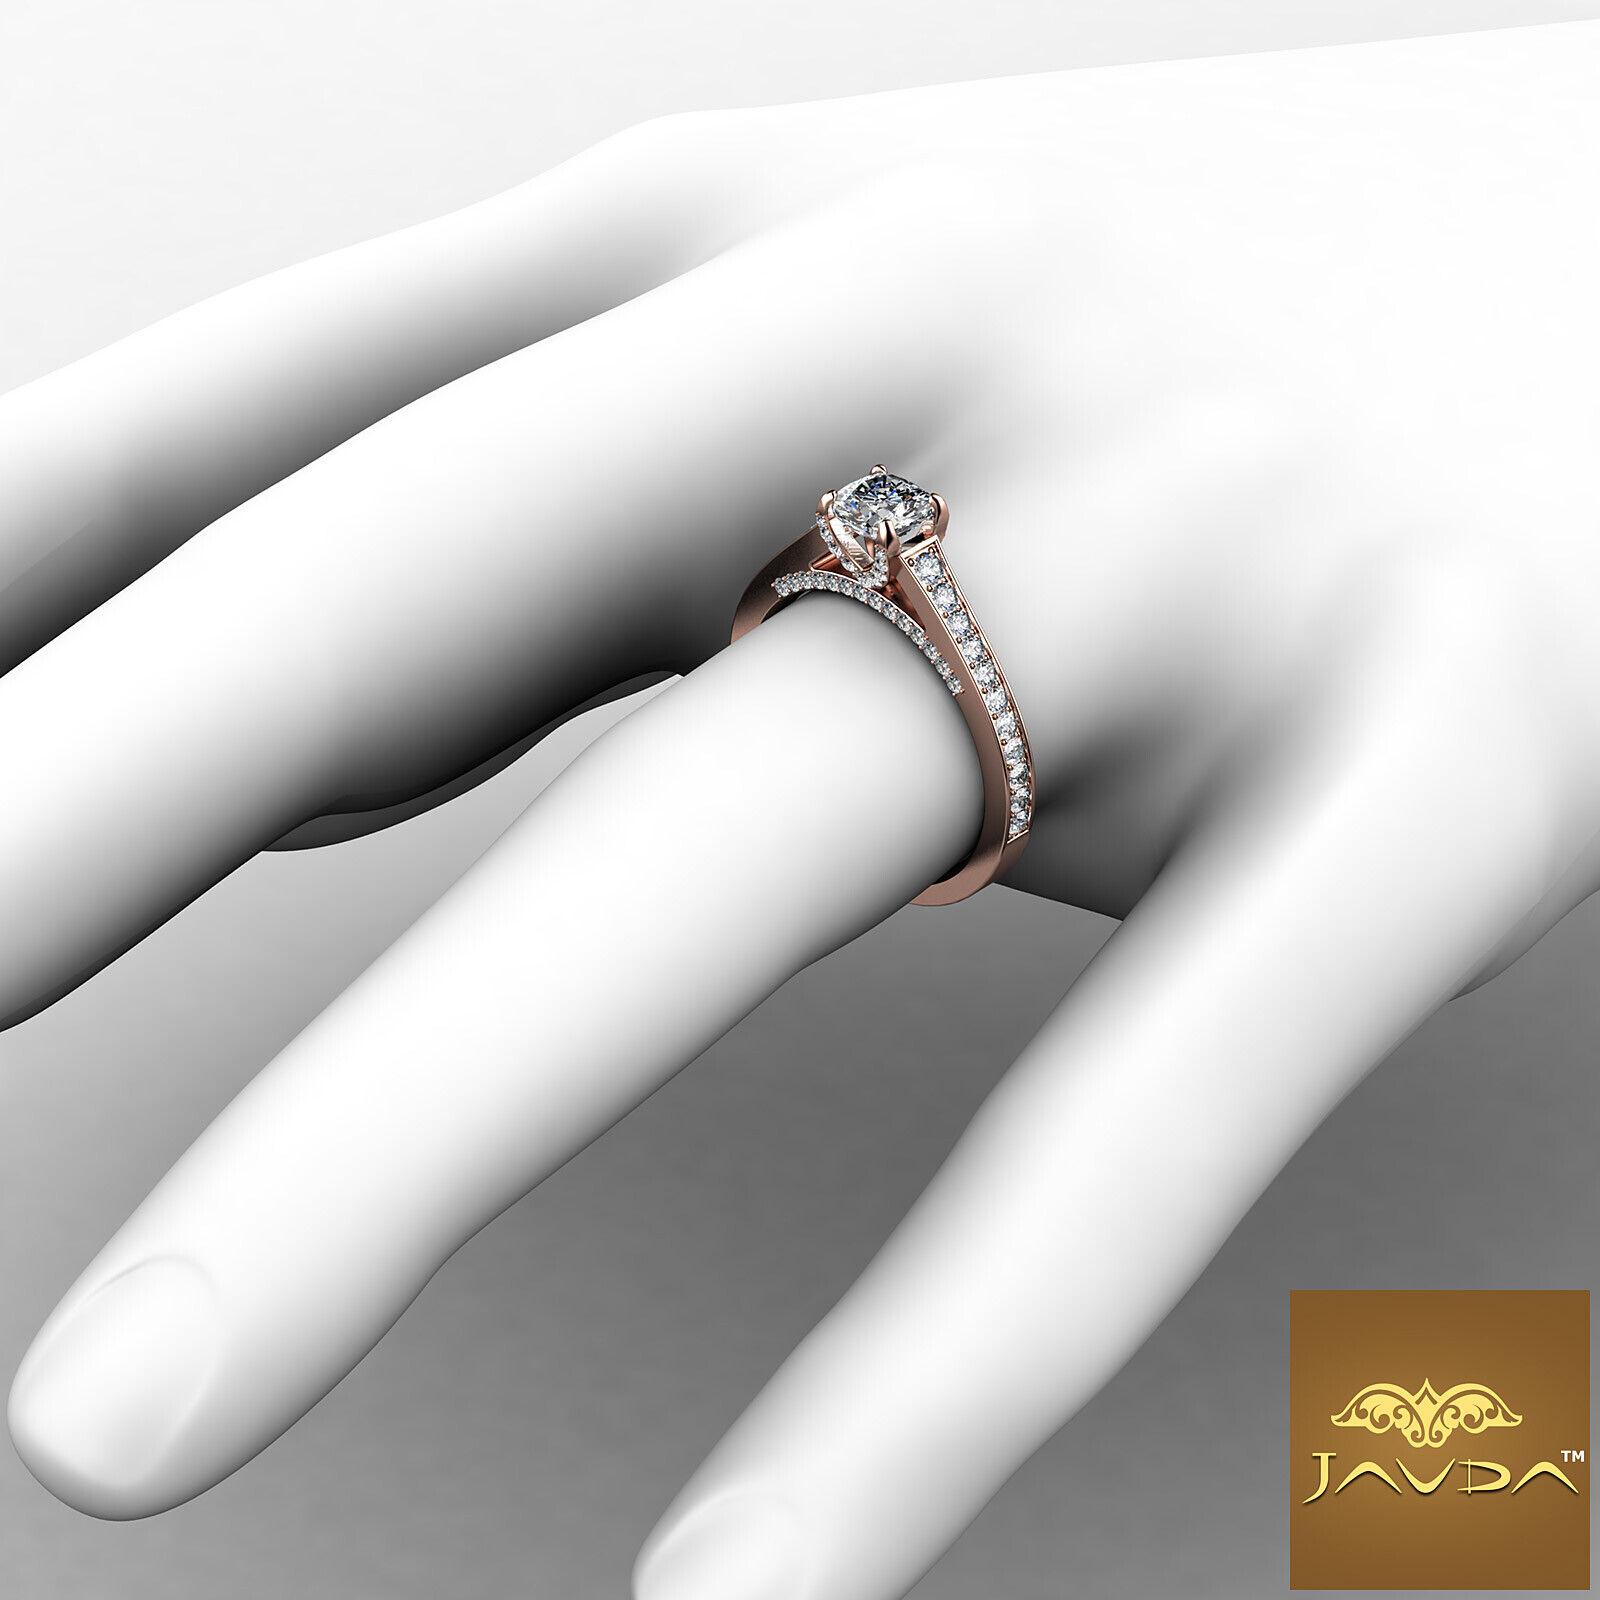 Cushion Cut Diamond Flawless Engagement GIA G VVS2 Pave Set Ring Platinum 1.25Ct 11